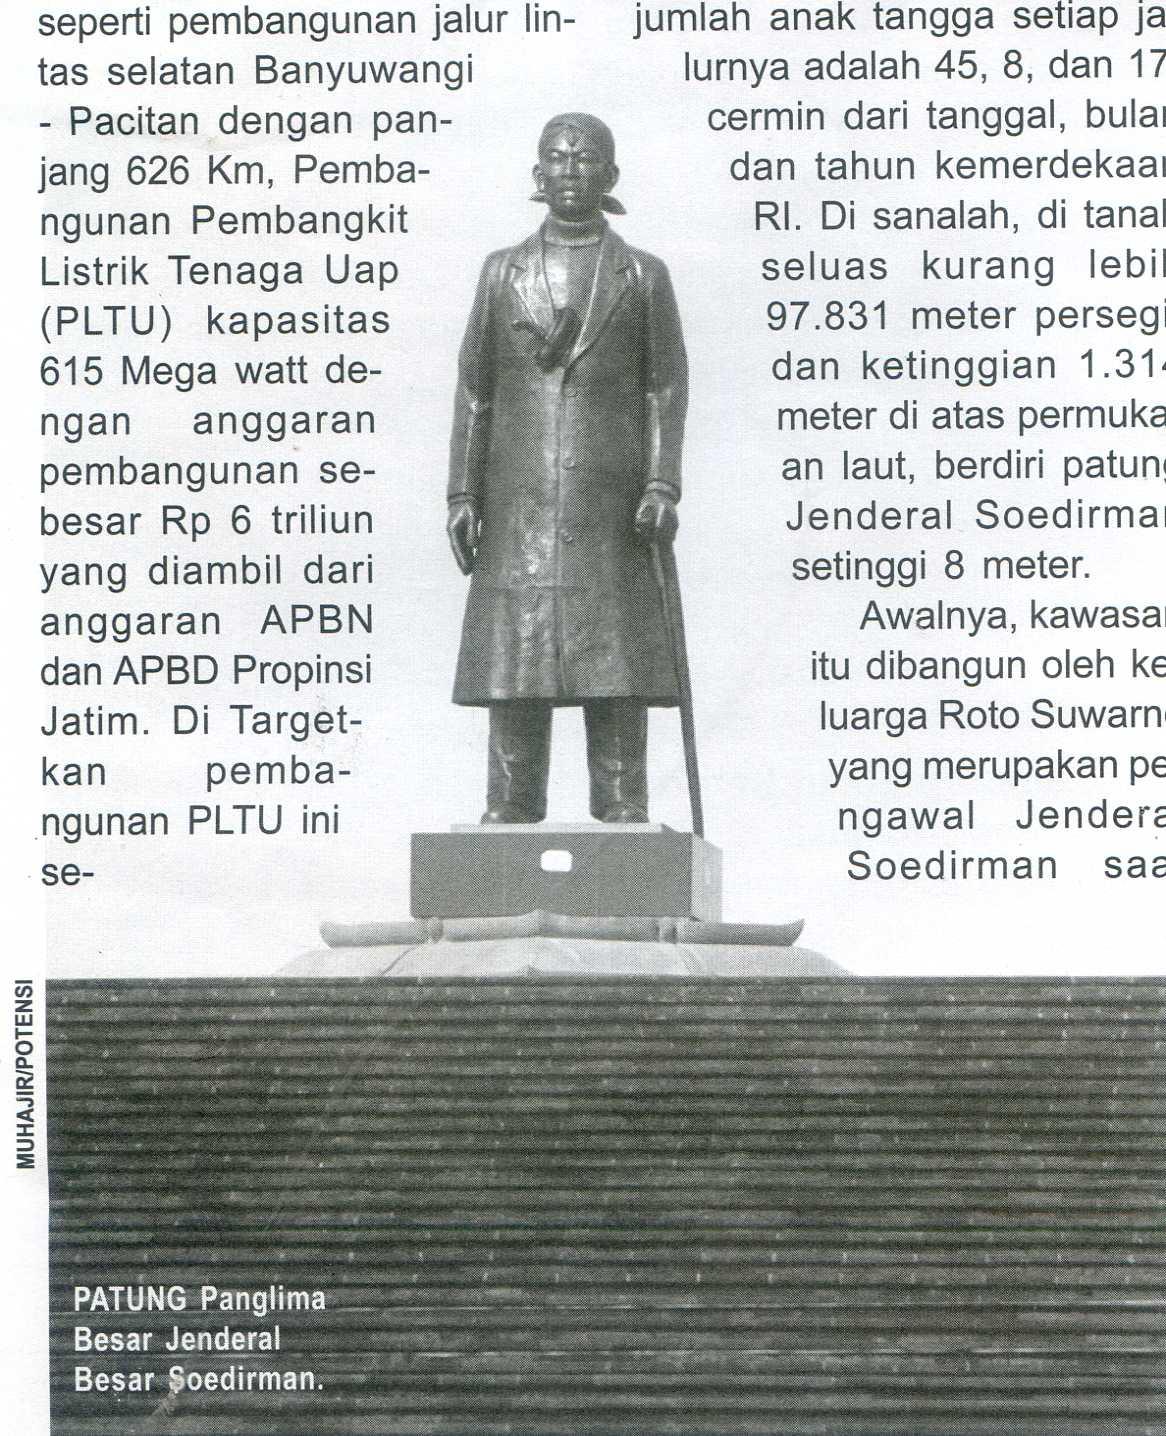 Monumen Jenderal Soedirman Pacitan Pusaka Jawatimuran Kab